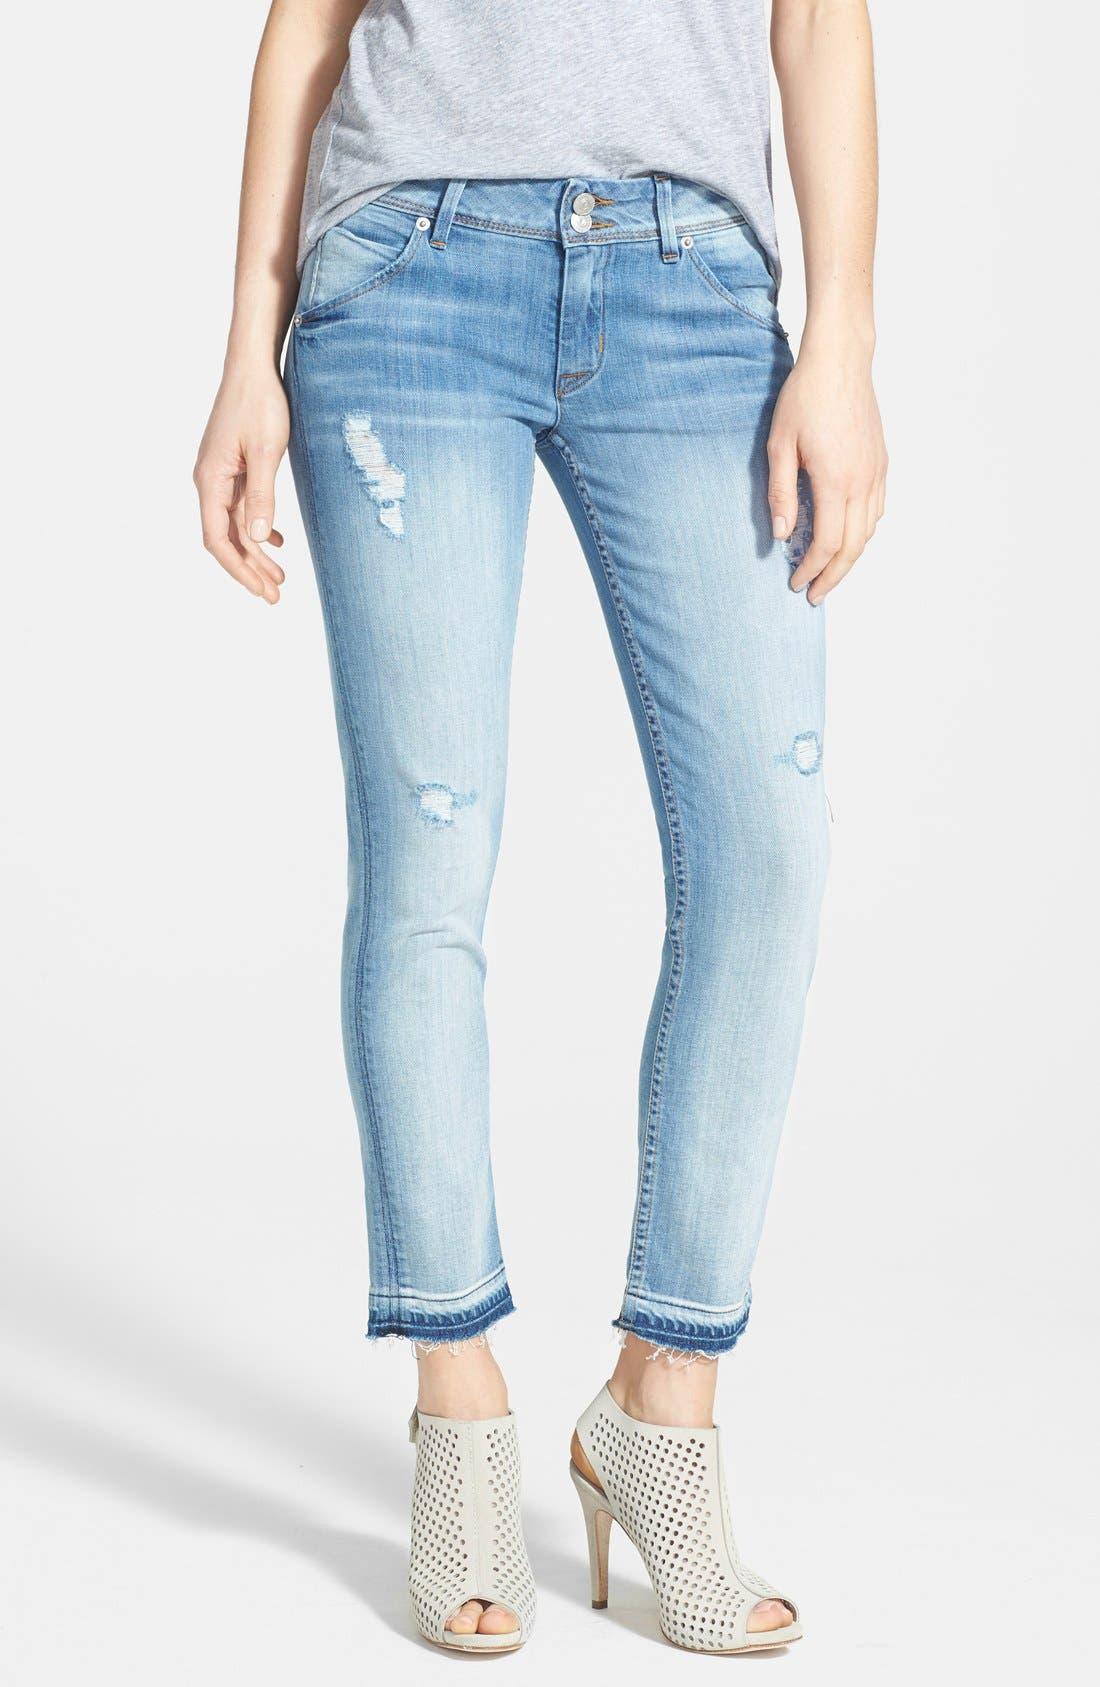 Alternate Image 1 Selected - Hudson Jeans 'Collin' Crop Skinny Jeans (Ladyland)